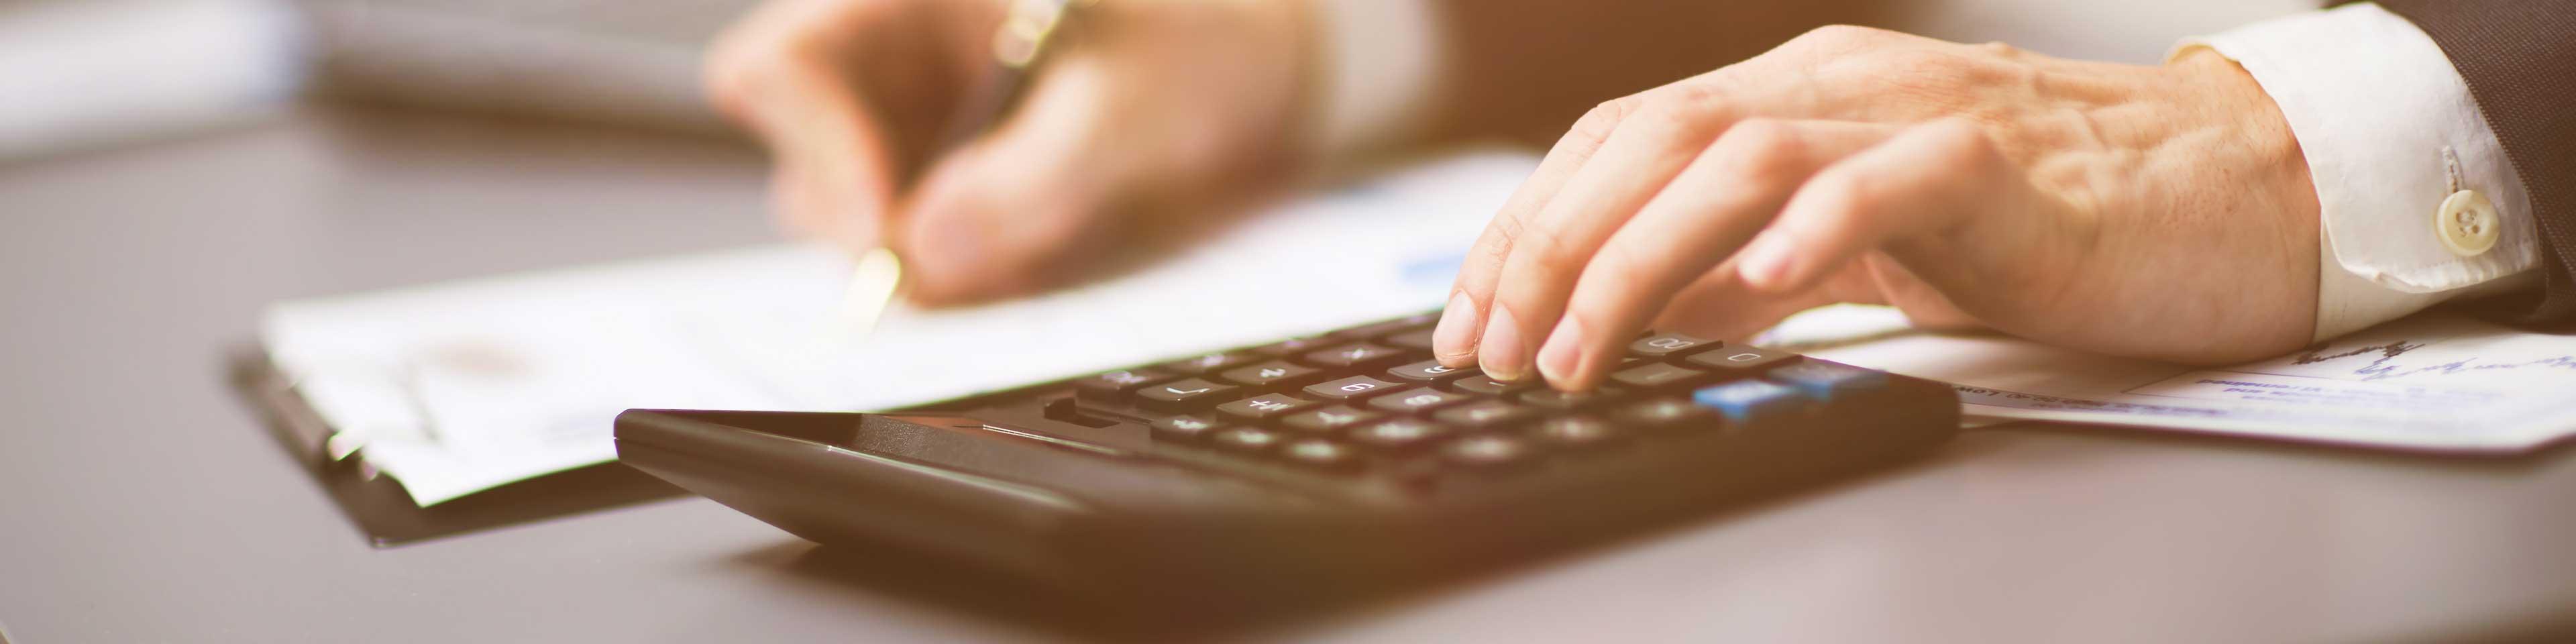 Kleos_estimating legal services cost